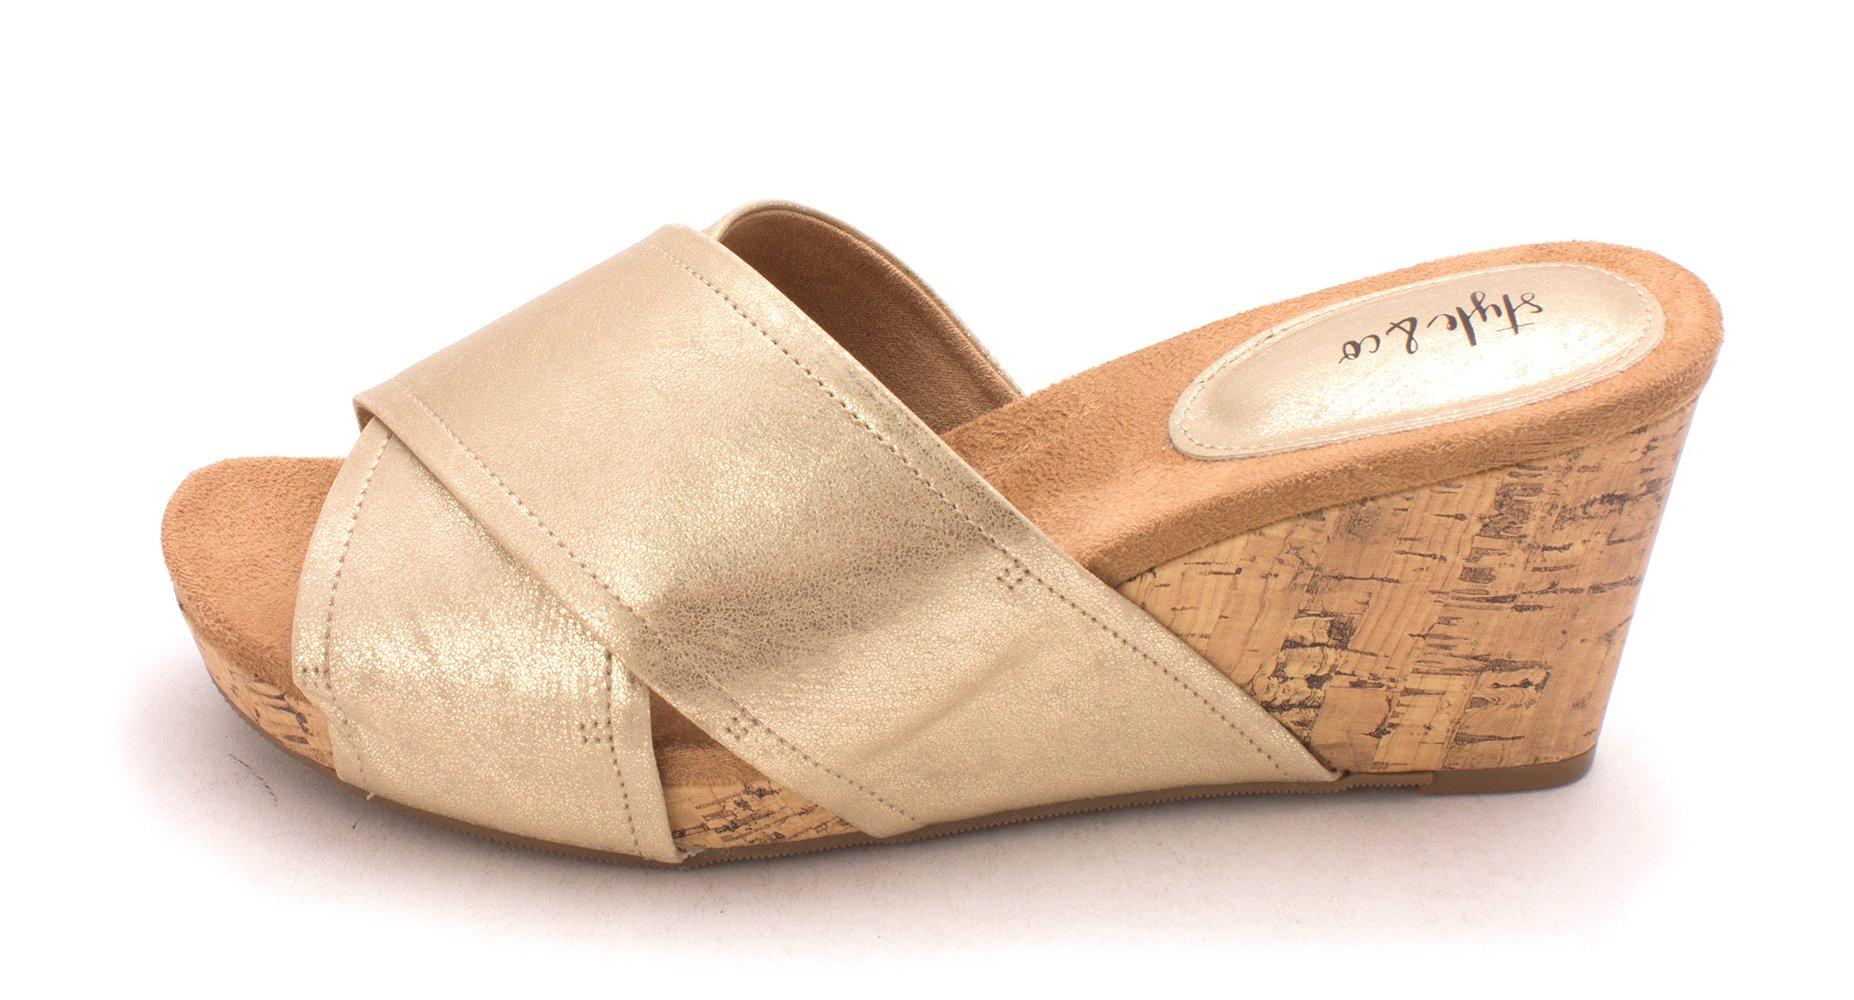 Style & Co. Womens Jill Open Toe Mules, Gold/Light, Size 8.5